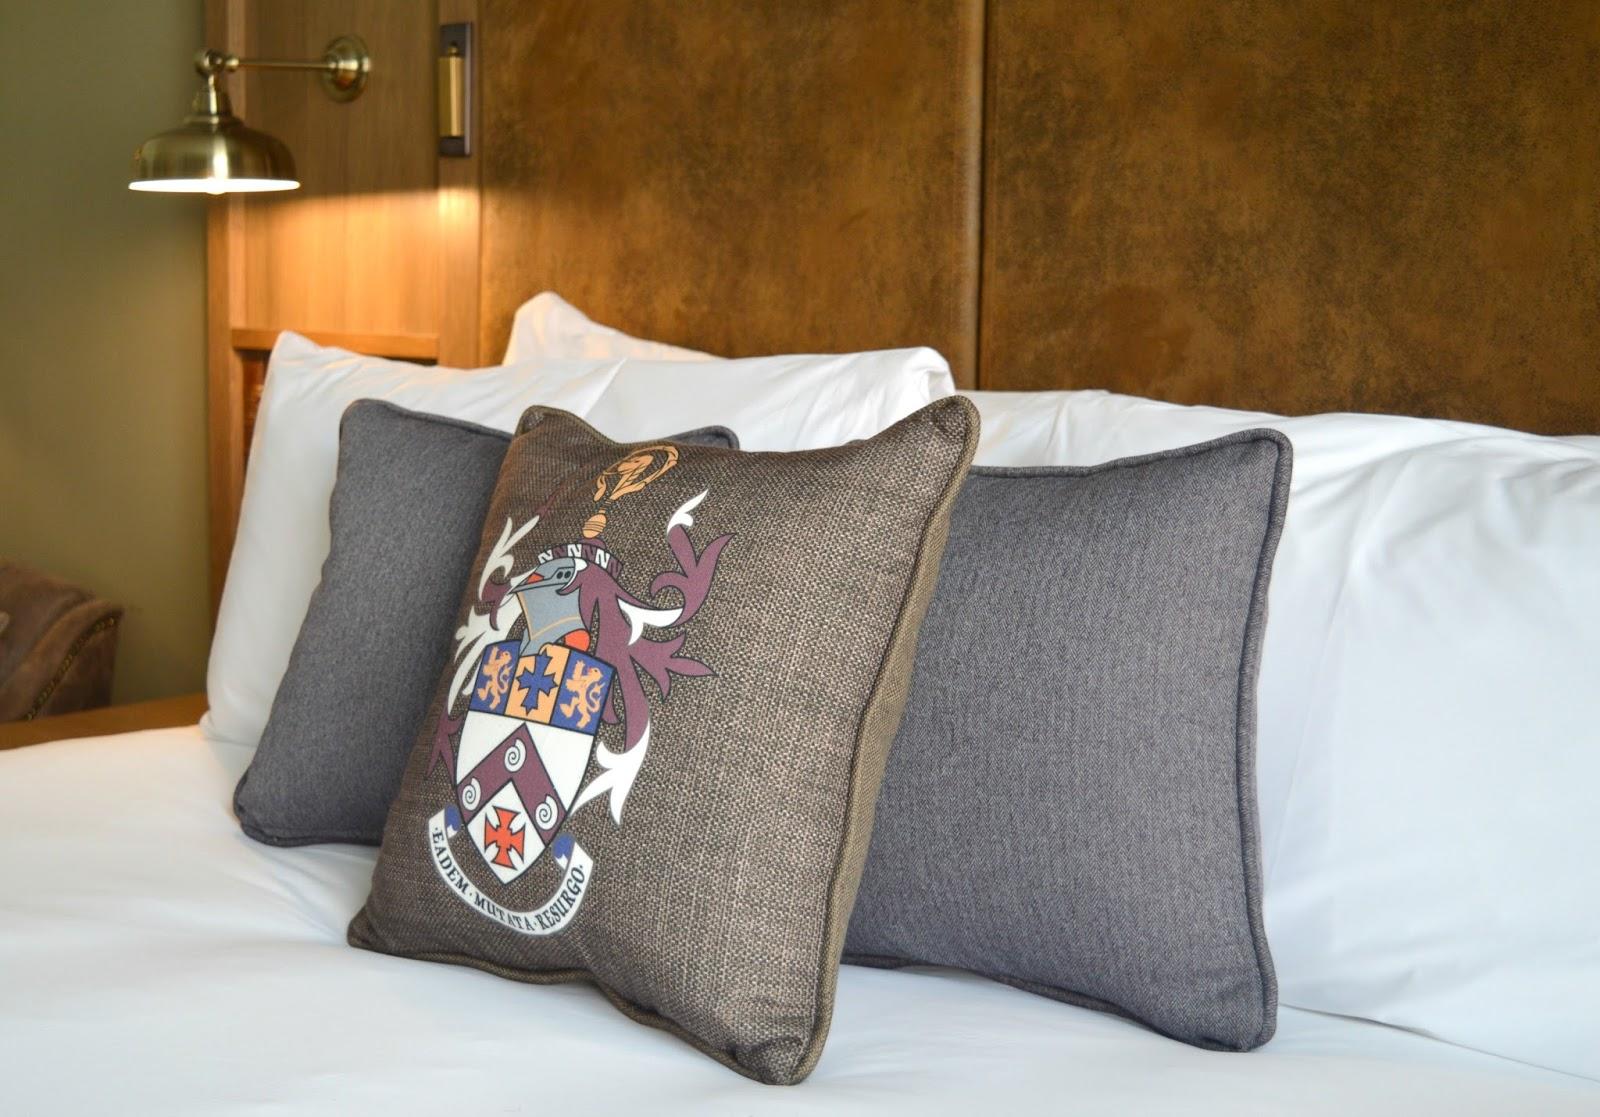 Hotel Indigo Durham City